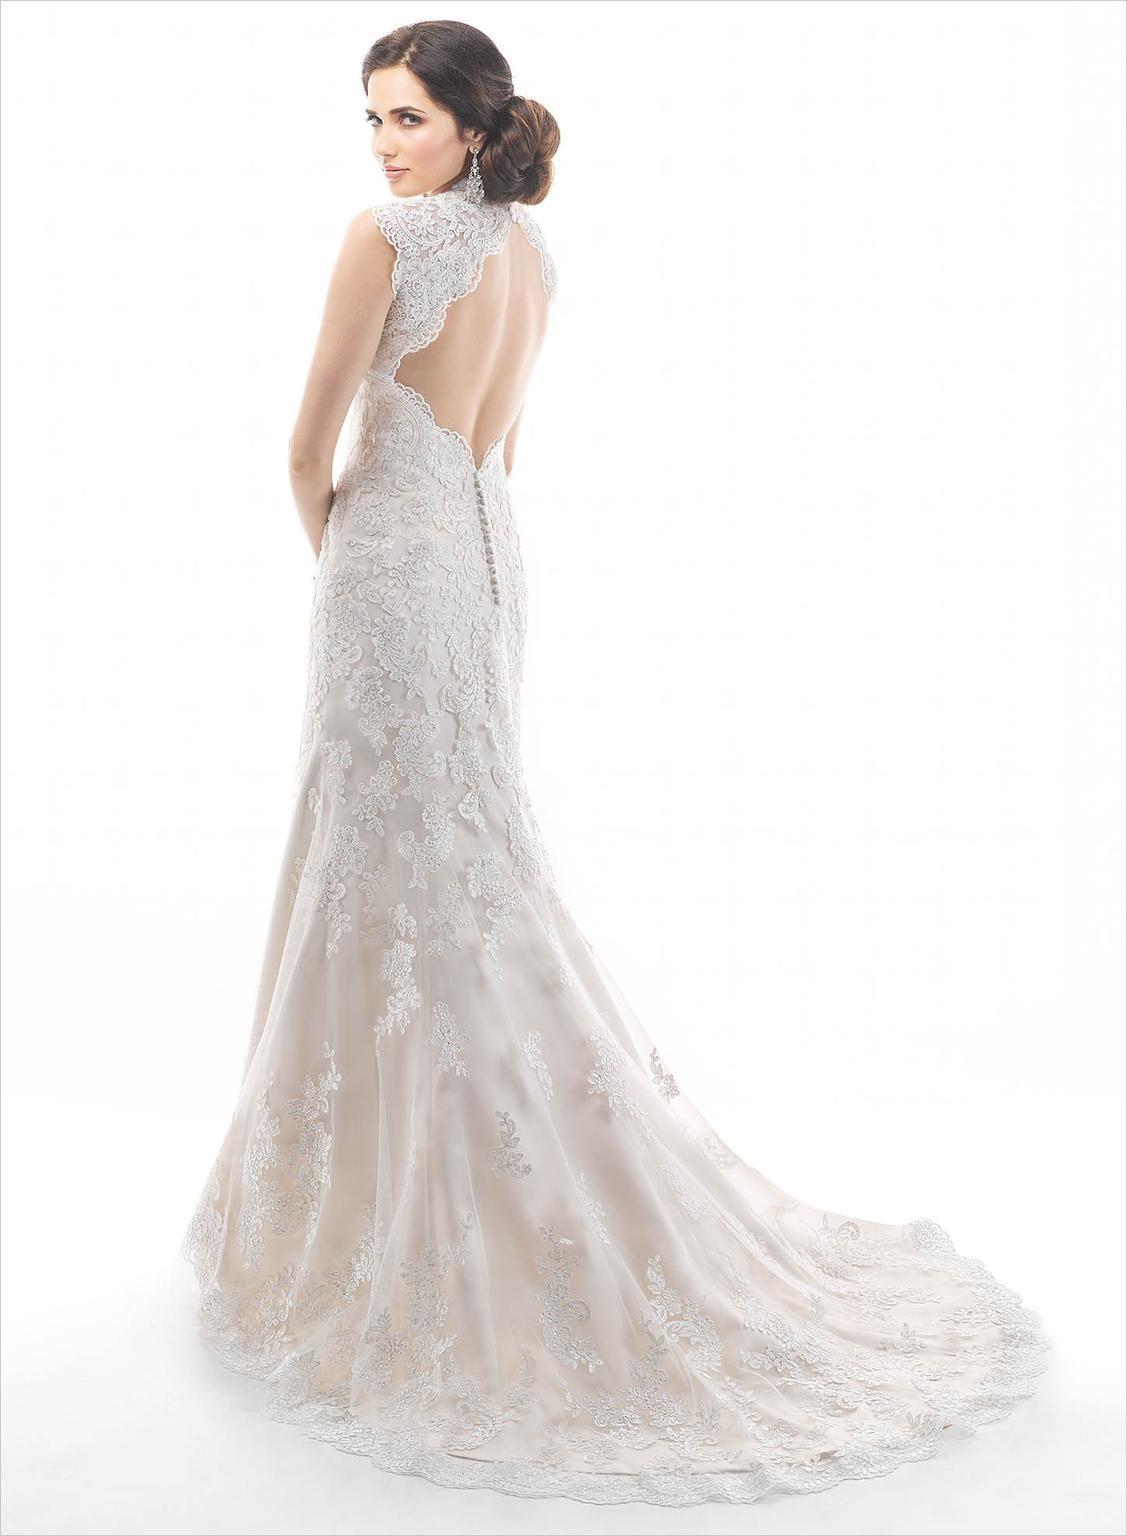 Maggie Sottero Jessica 4ms912 Wedding Dress New Size 12